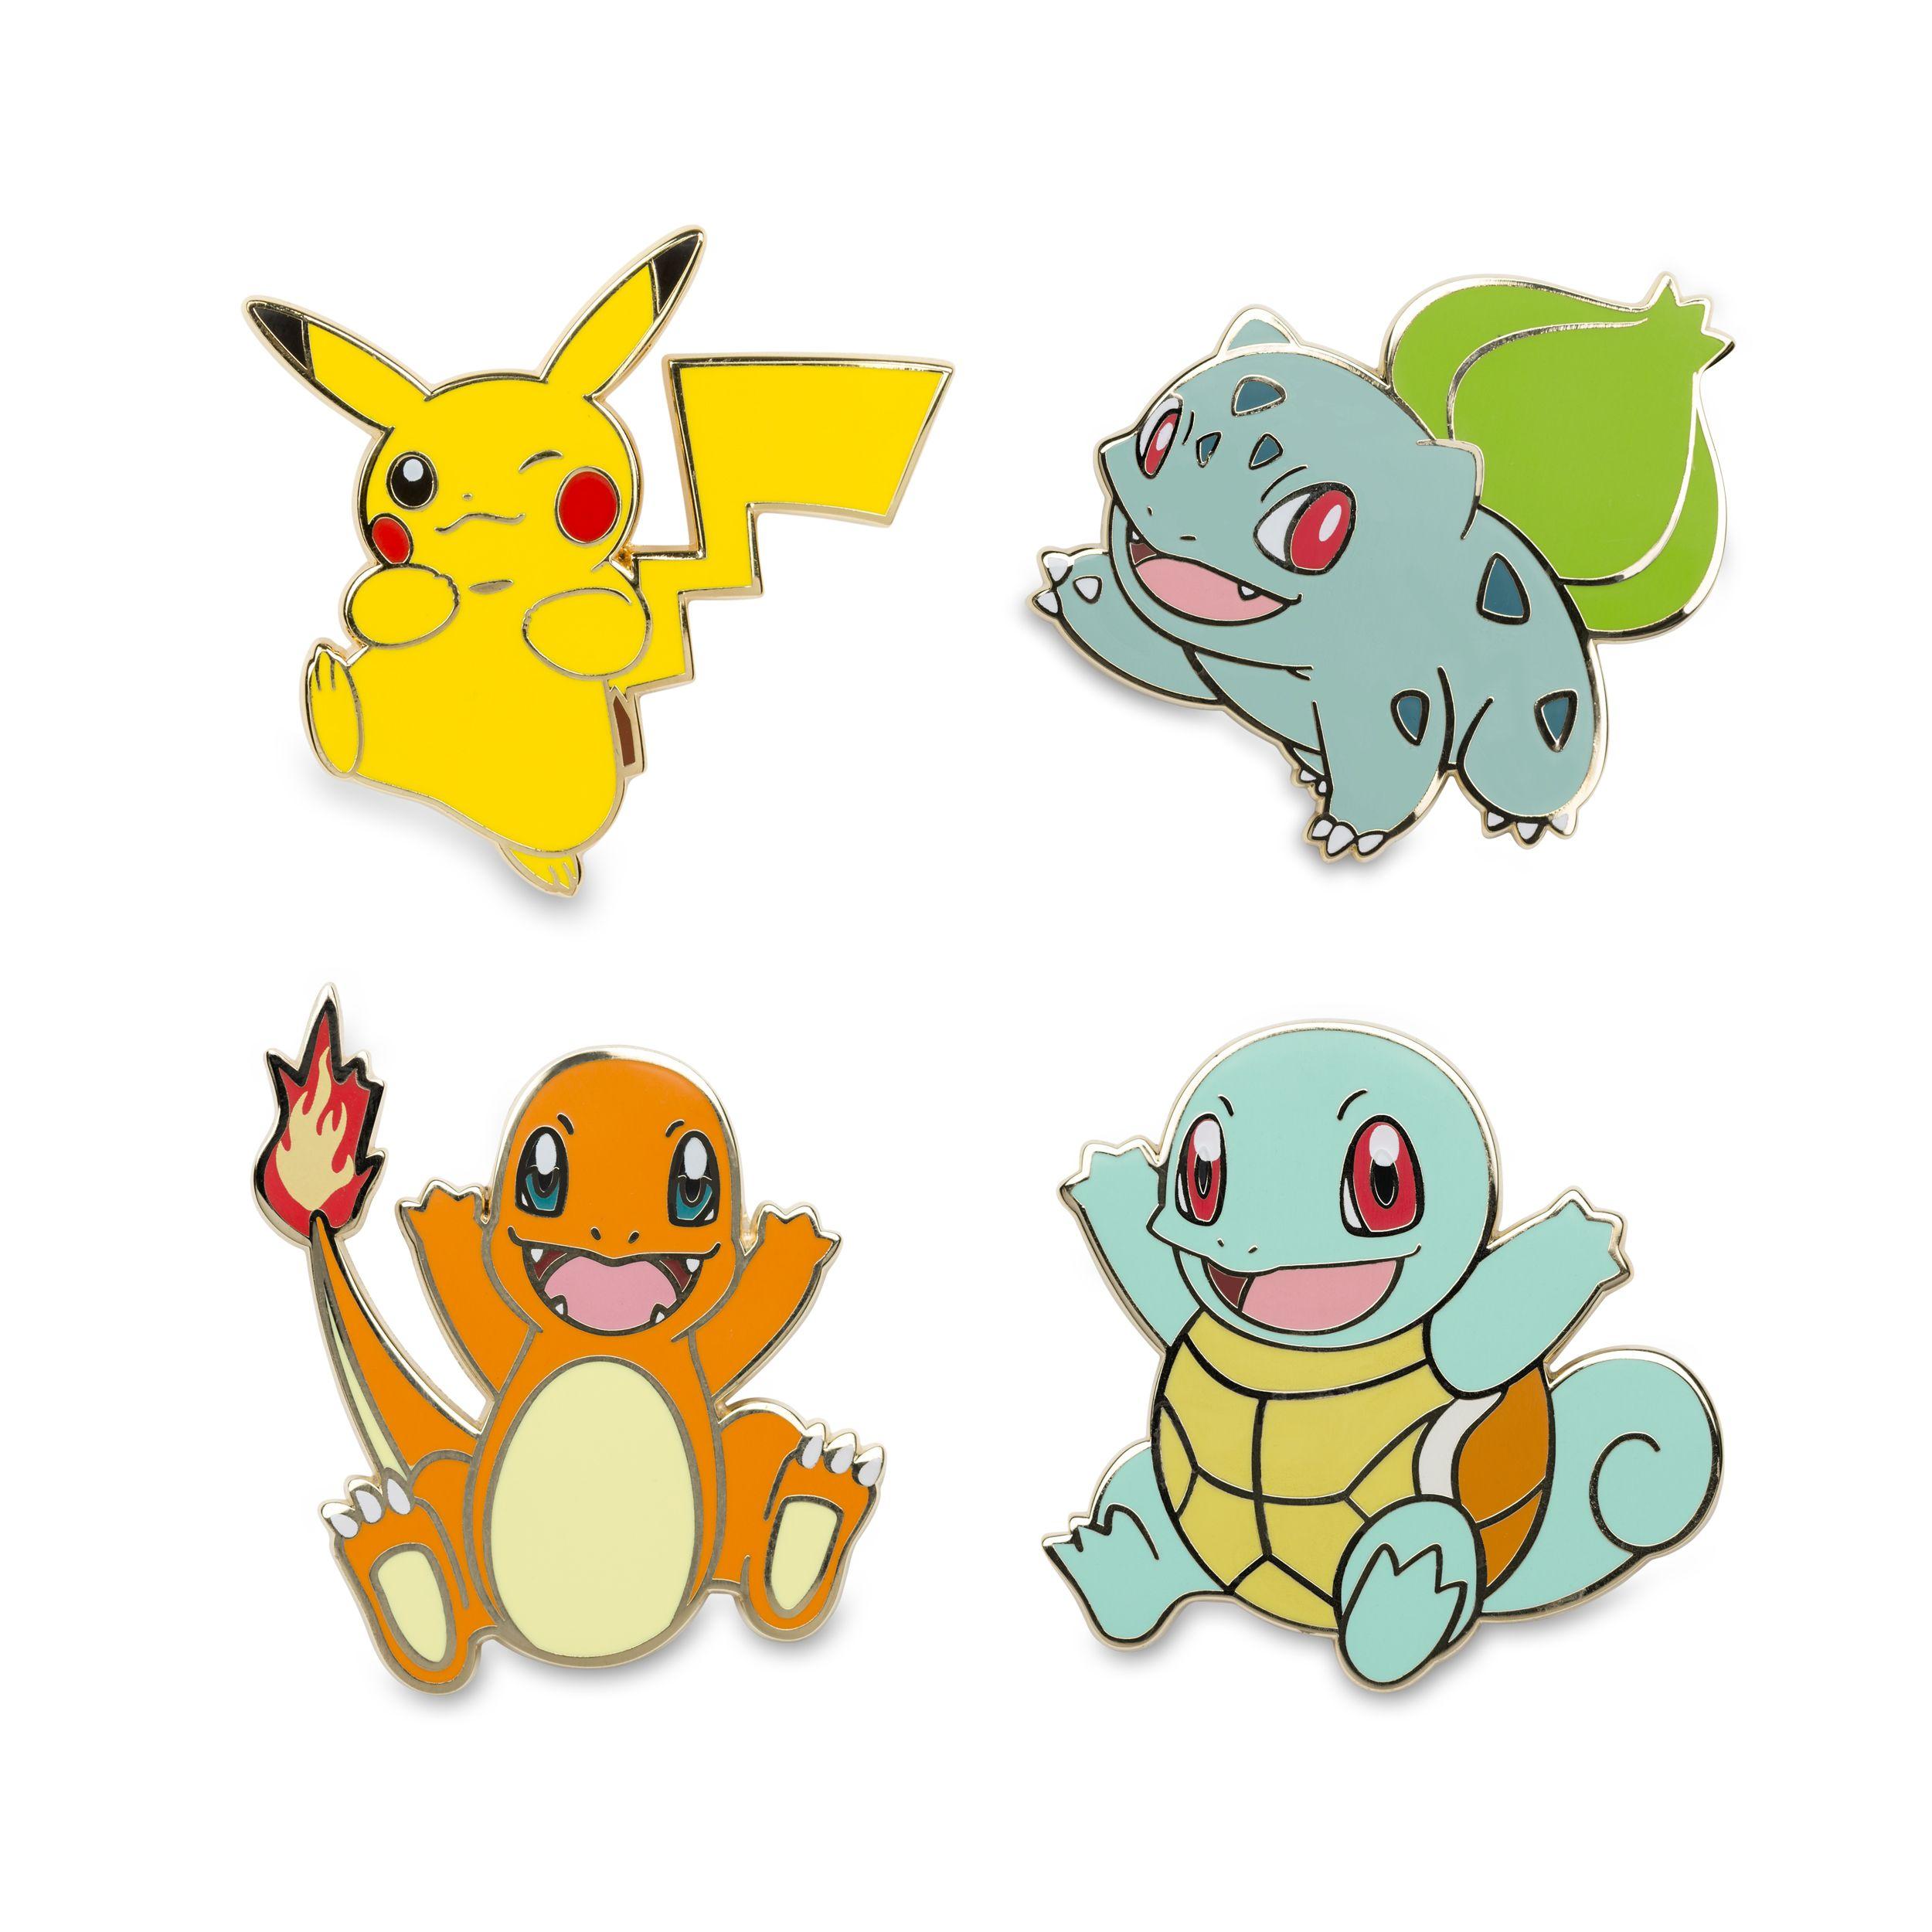 Pikachu Bulbasaur Charmander Squirtle Pokemon Pins Pin